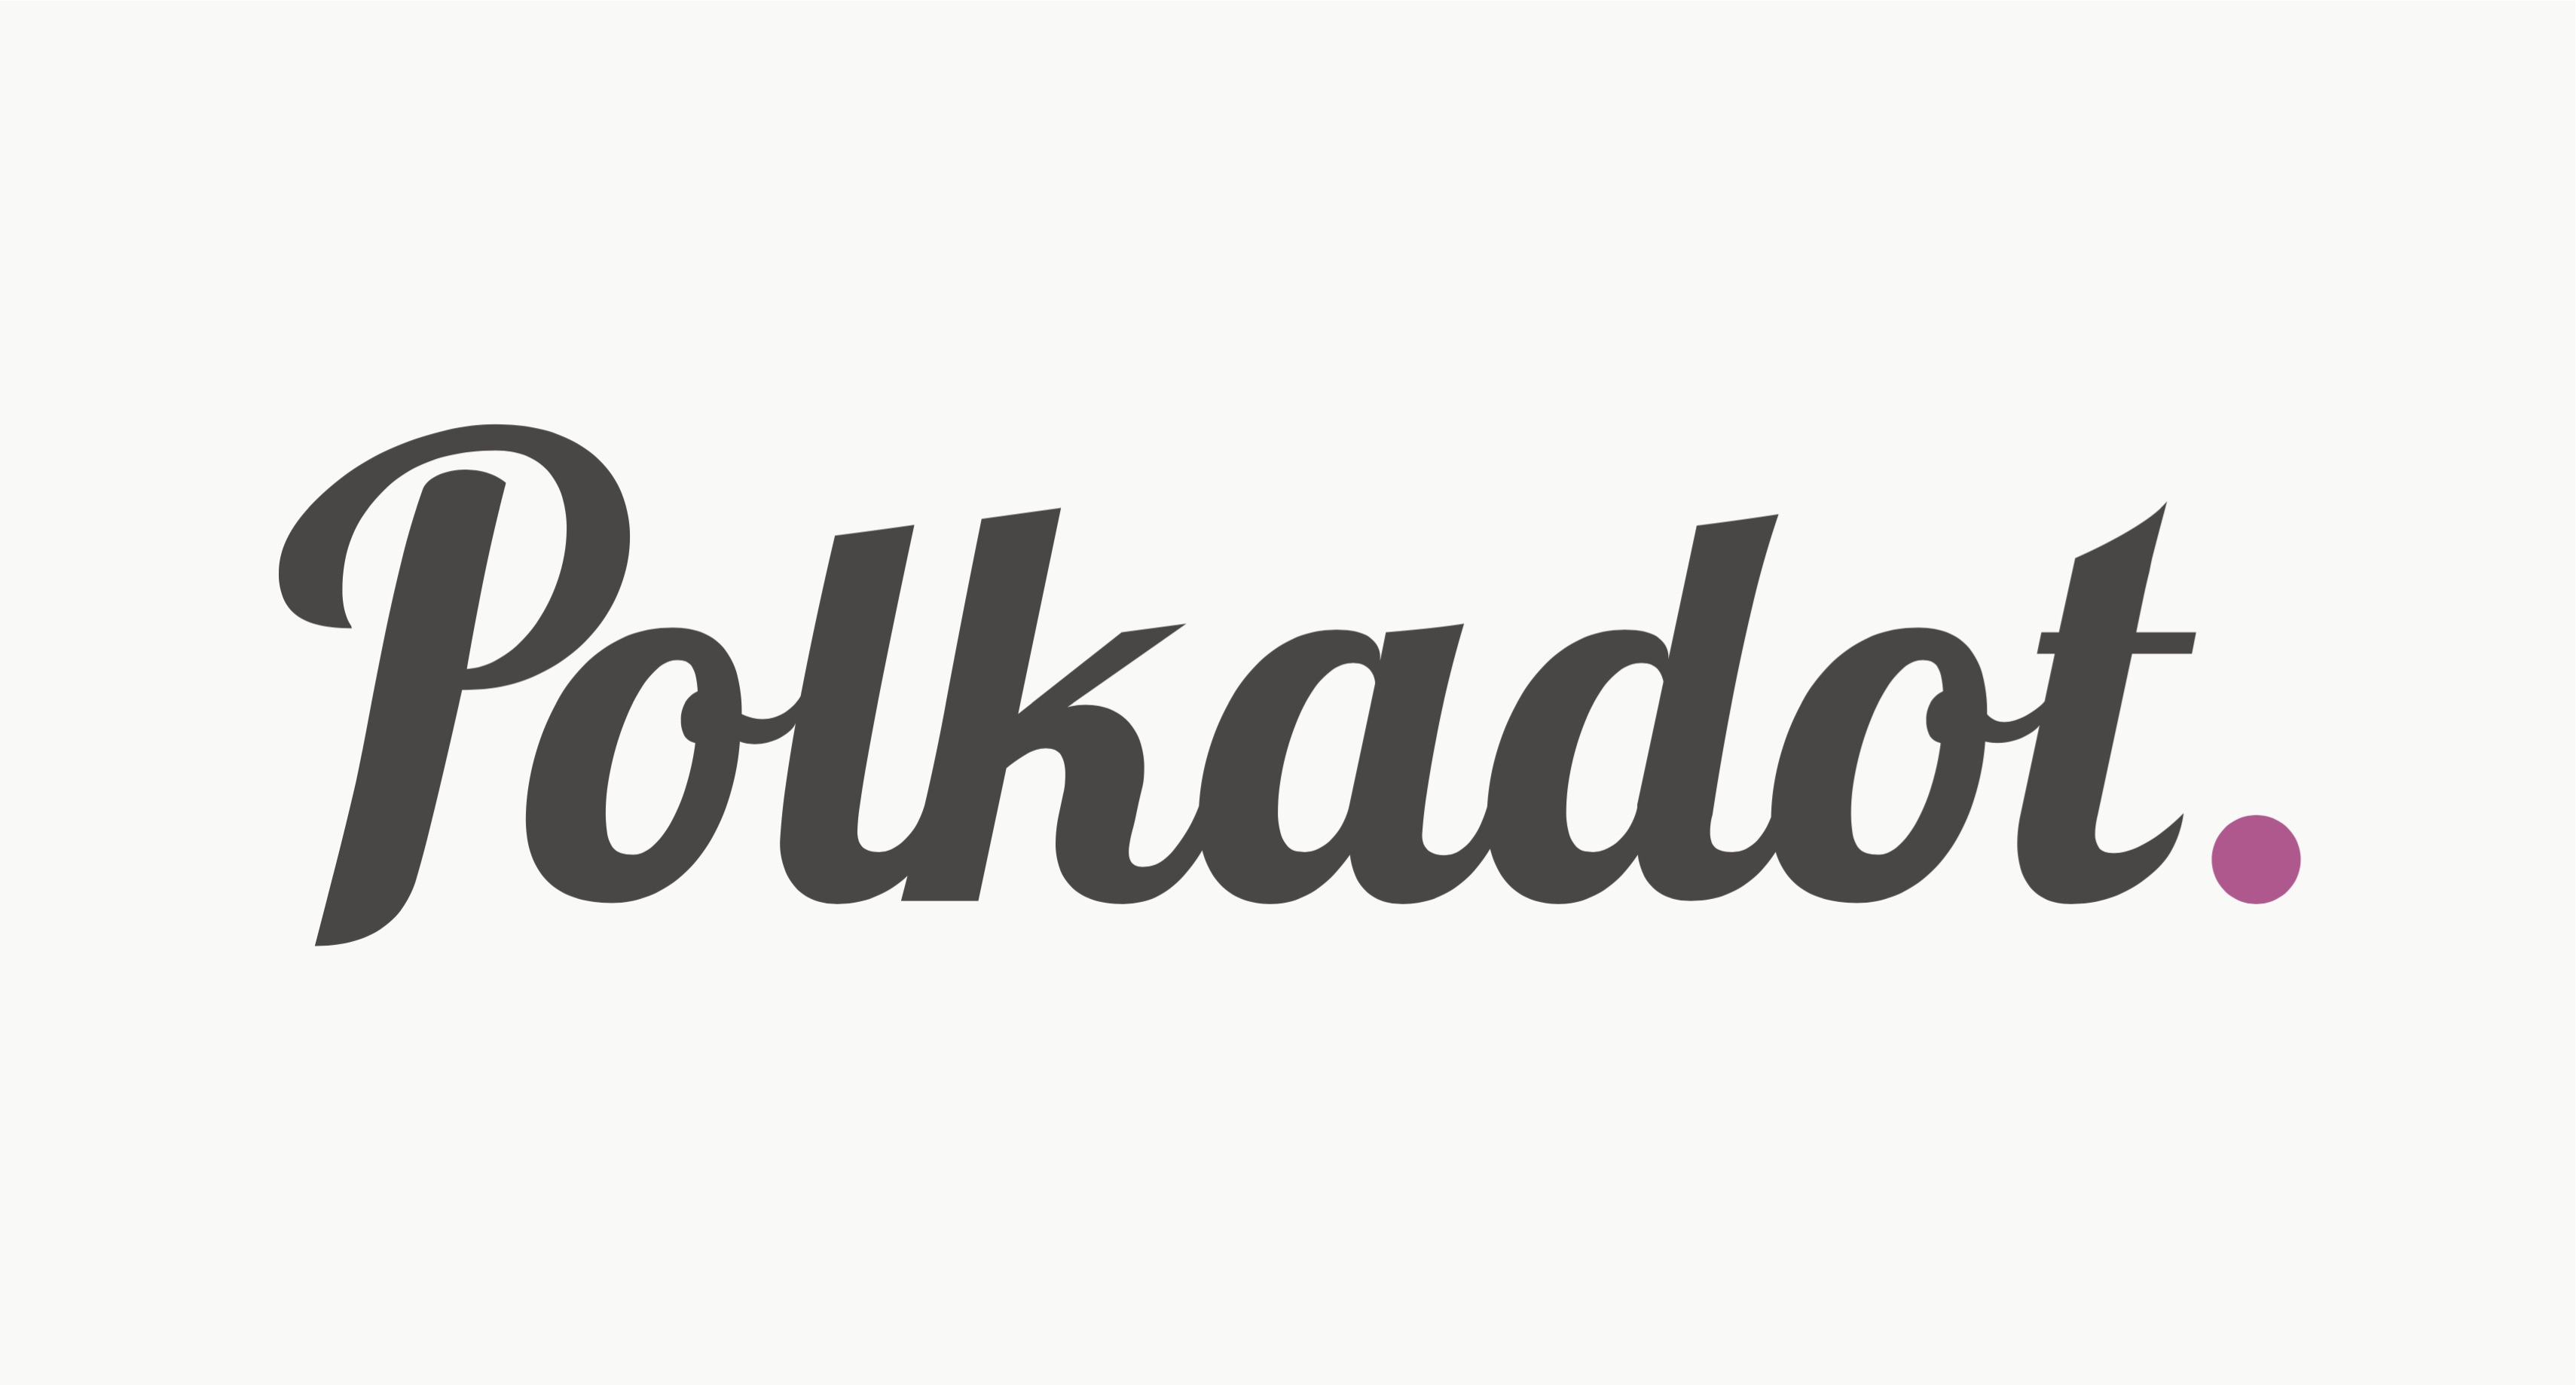 Polkadot cryptocurrency - Best 5 Smart Contract Platforms for Polkadot DApp Dev